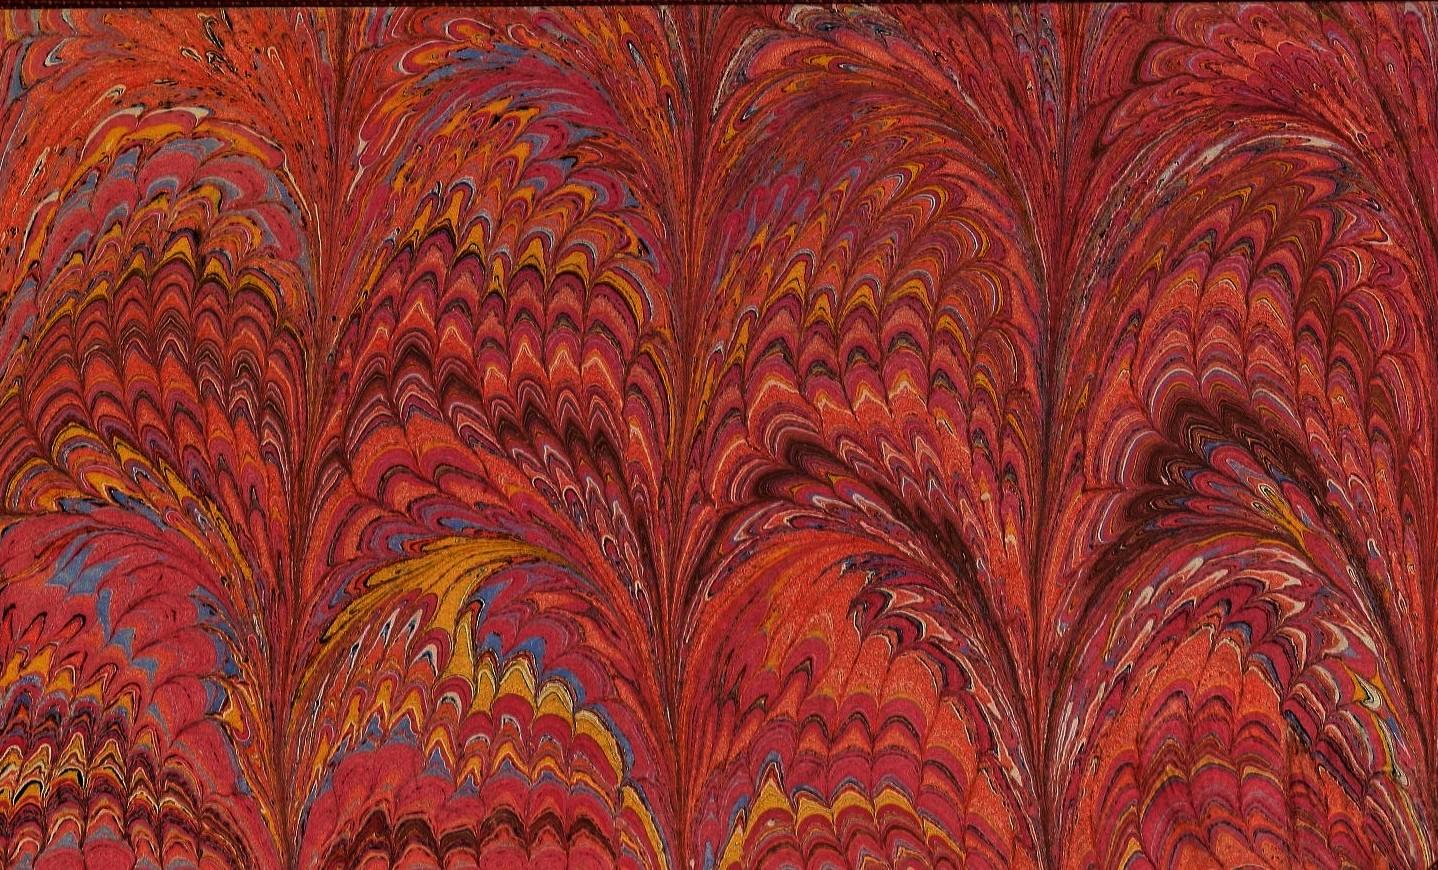 http://3.bp.blogspot.com/-mJeMP0VE4pg/UHU84pVpm4I/AAAAAAAAJx8/6l07OUnTDWE/s1600/background-for-design-graphic-12.jpg